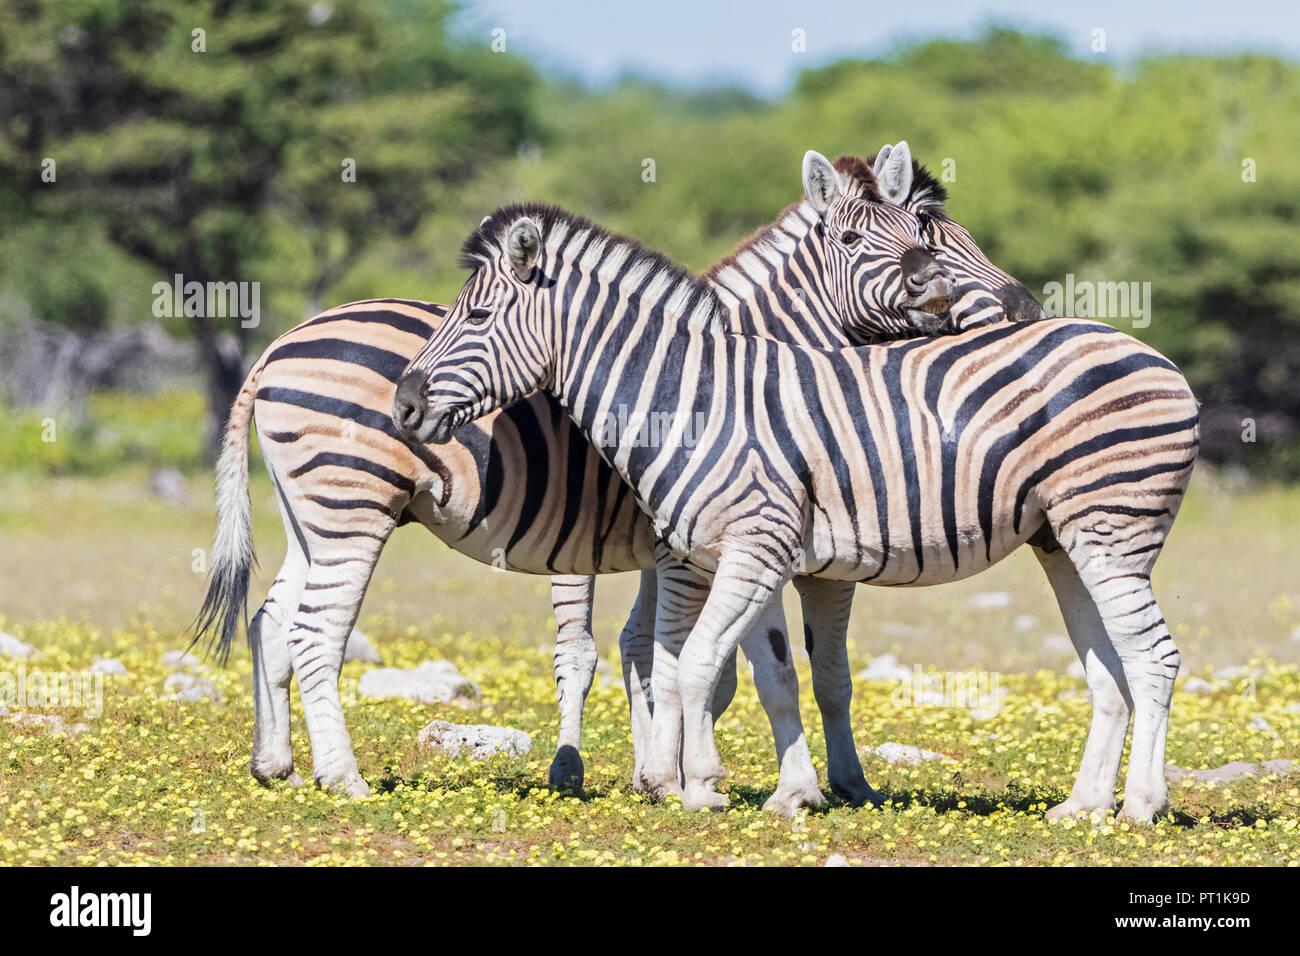 Africa, Namibia, Etosha National Park, burchell's zebras, Equus quagga burchelli - Stock Image